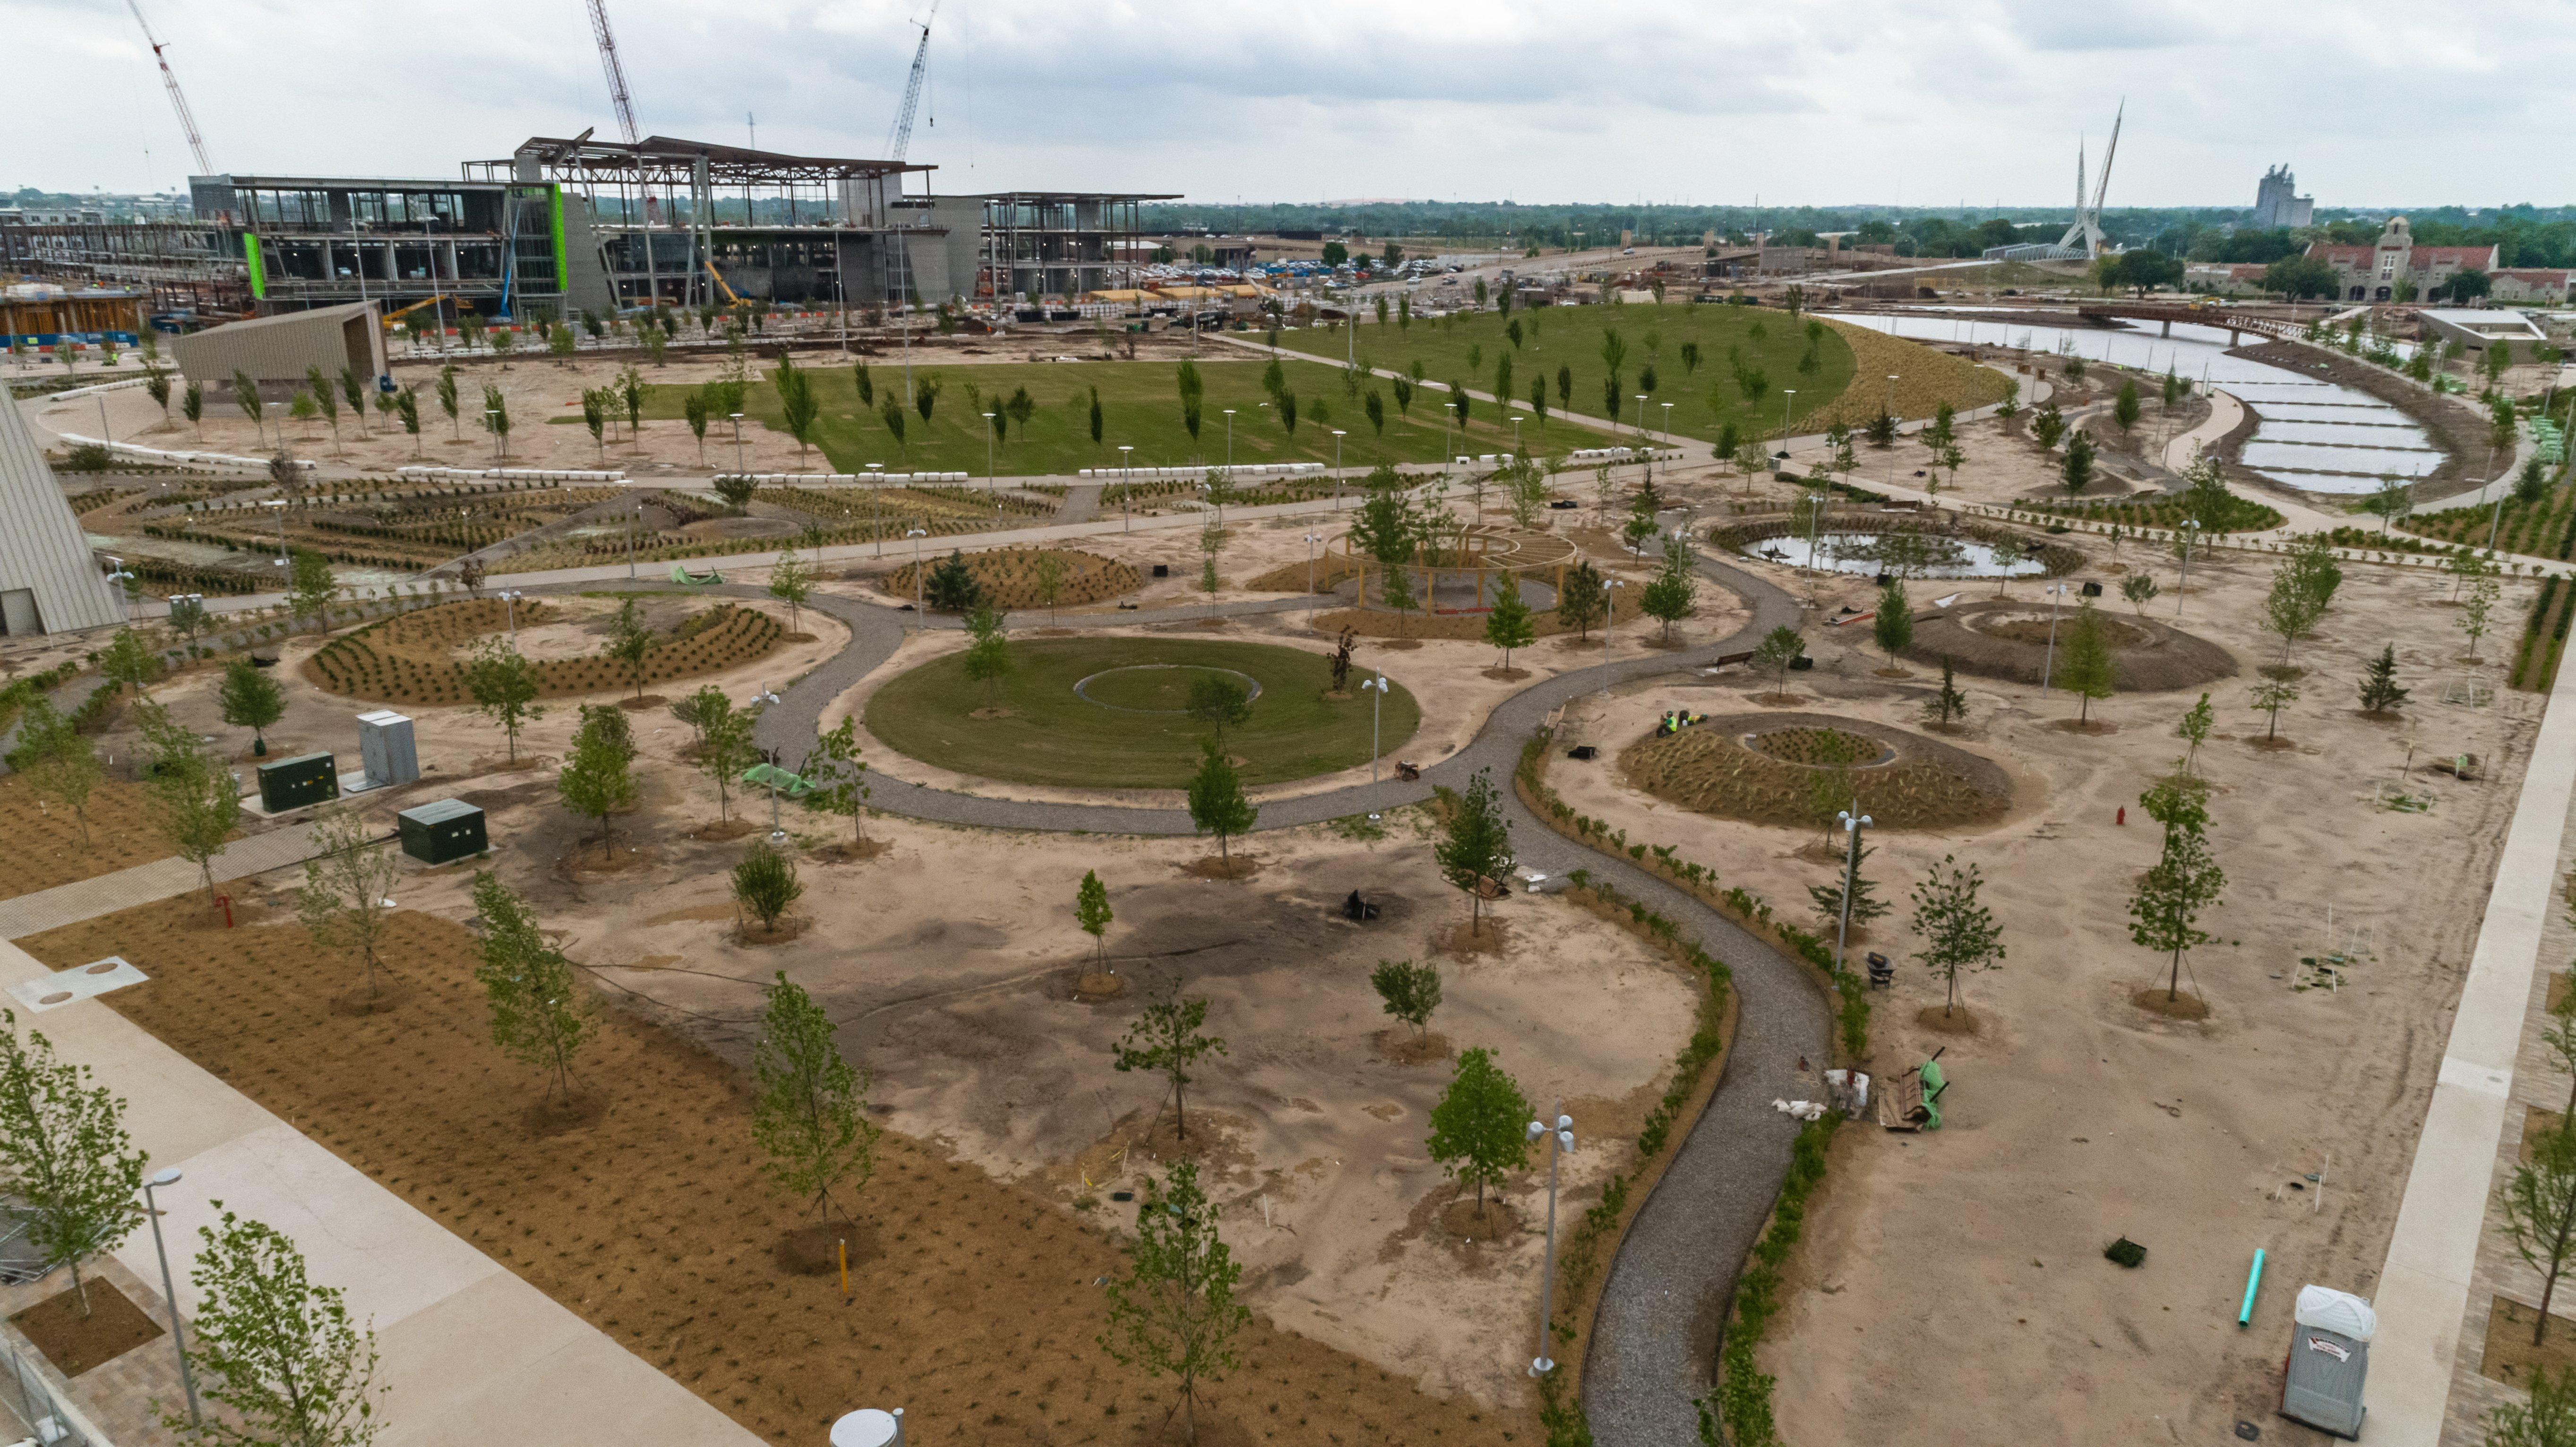 Innovative irrigation keeps Scissortail Park 'green'